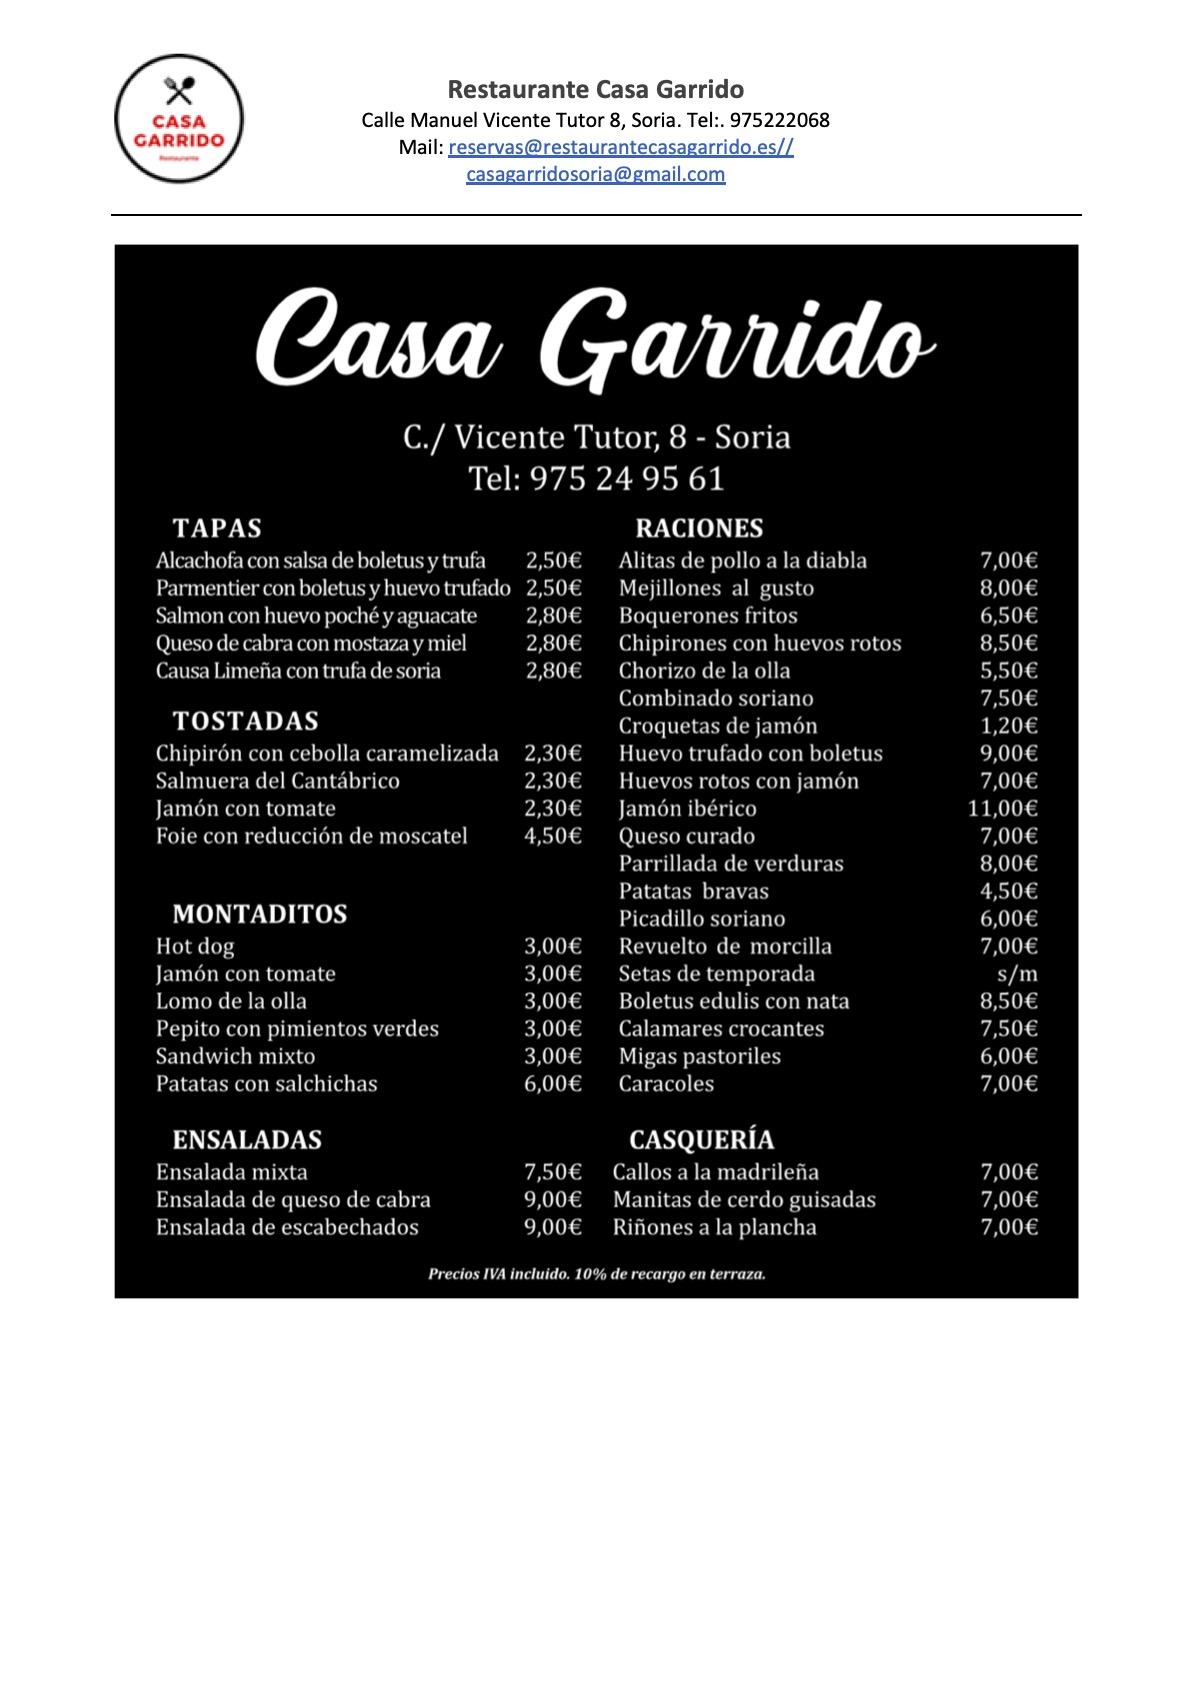 Carta-Completa-Casa-Garrido-2021-2_m3j7f87c.jpg